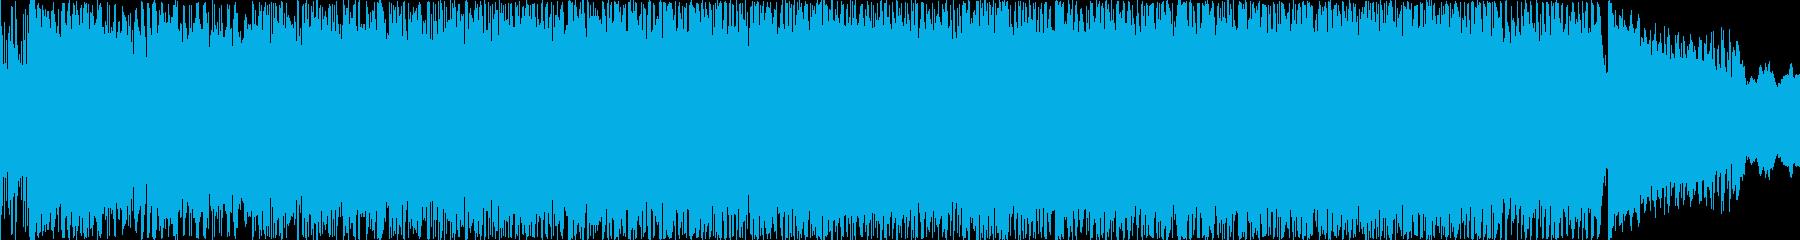 EDMとロックのBGMの再生済みの波形